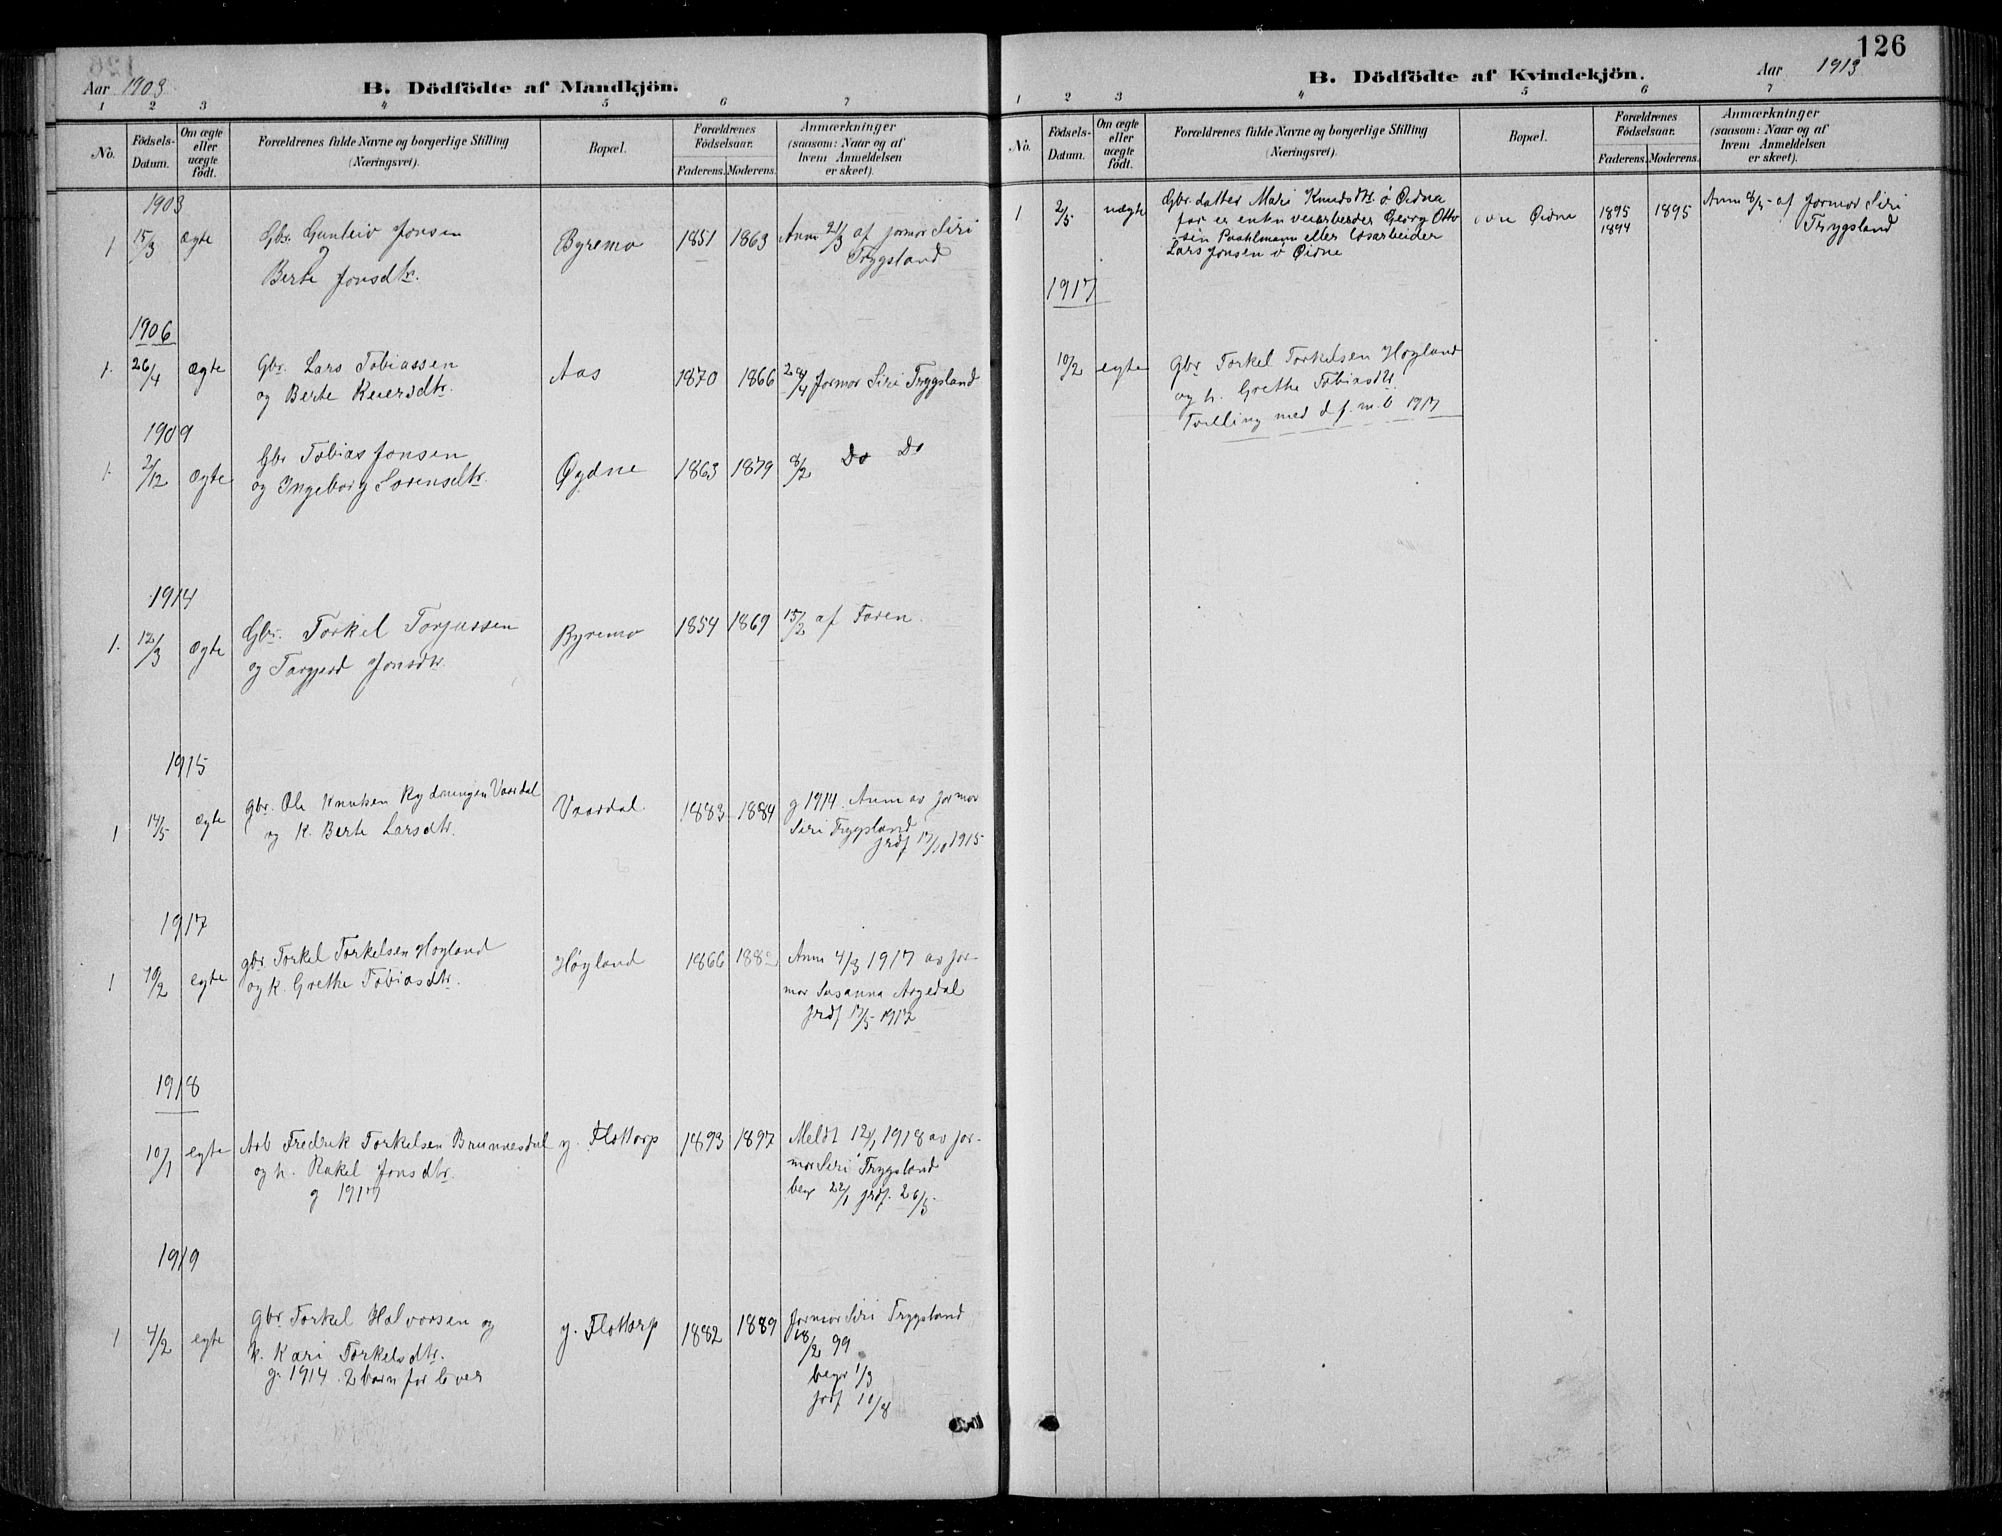 SAK, Bjelland sokneprestkontor, F/Fb/Fbc/L0003: Klokkerbok nr. B 3, 1887-1924, s. 126